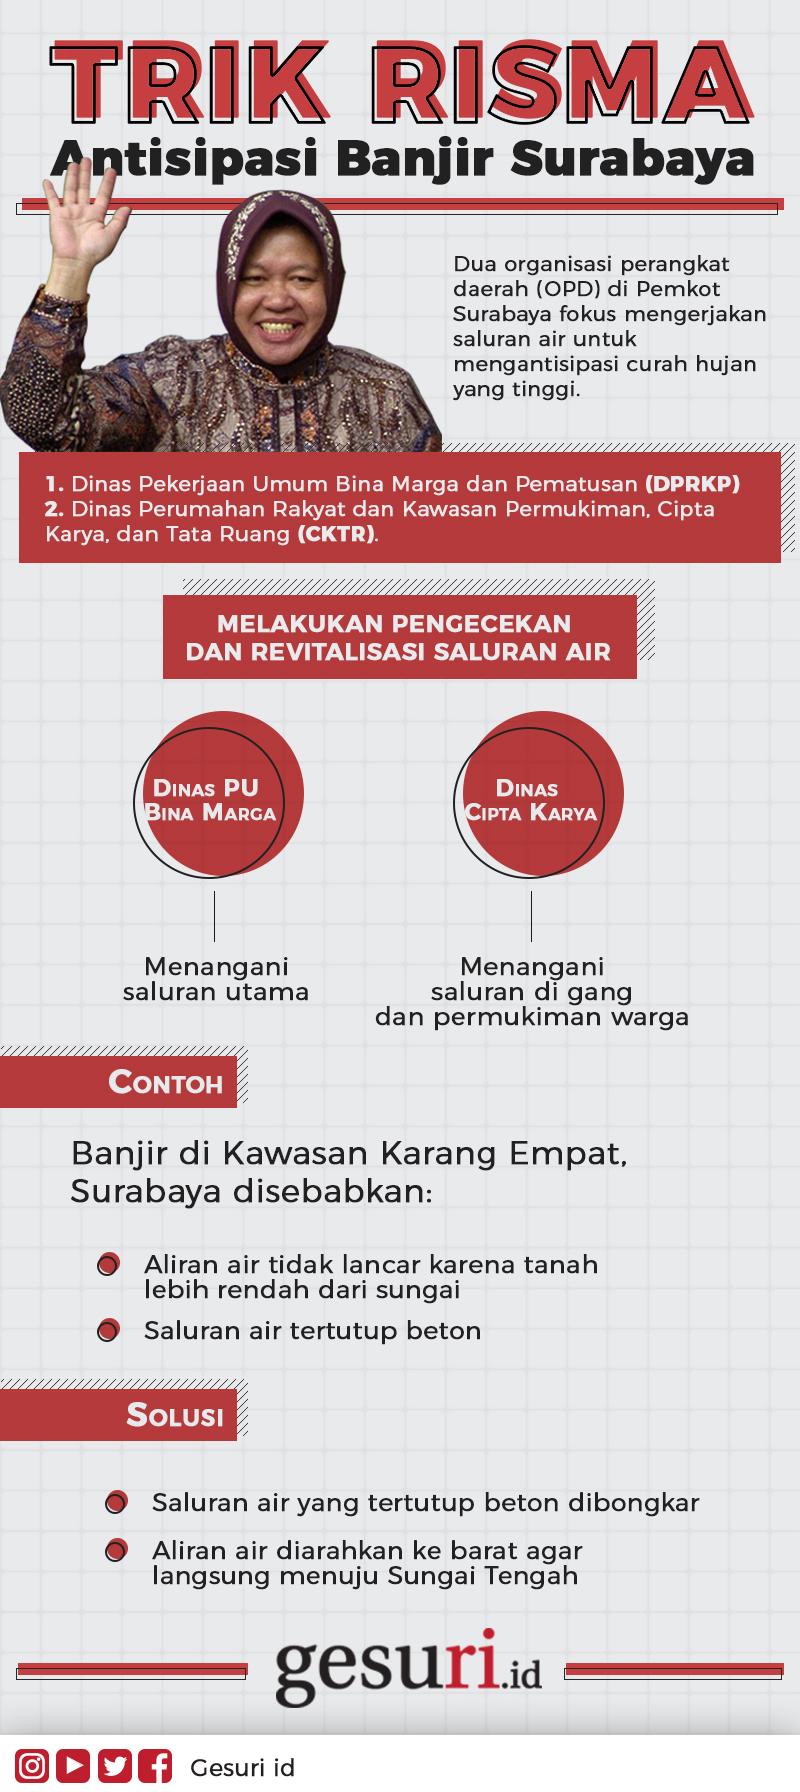 Trik Risma Antisipasi banjir di Surabaya